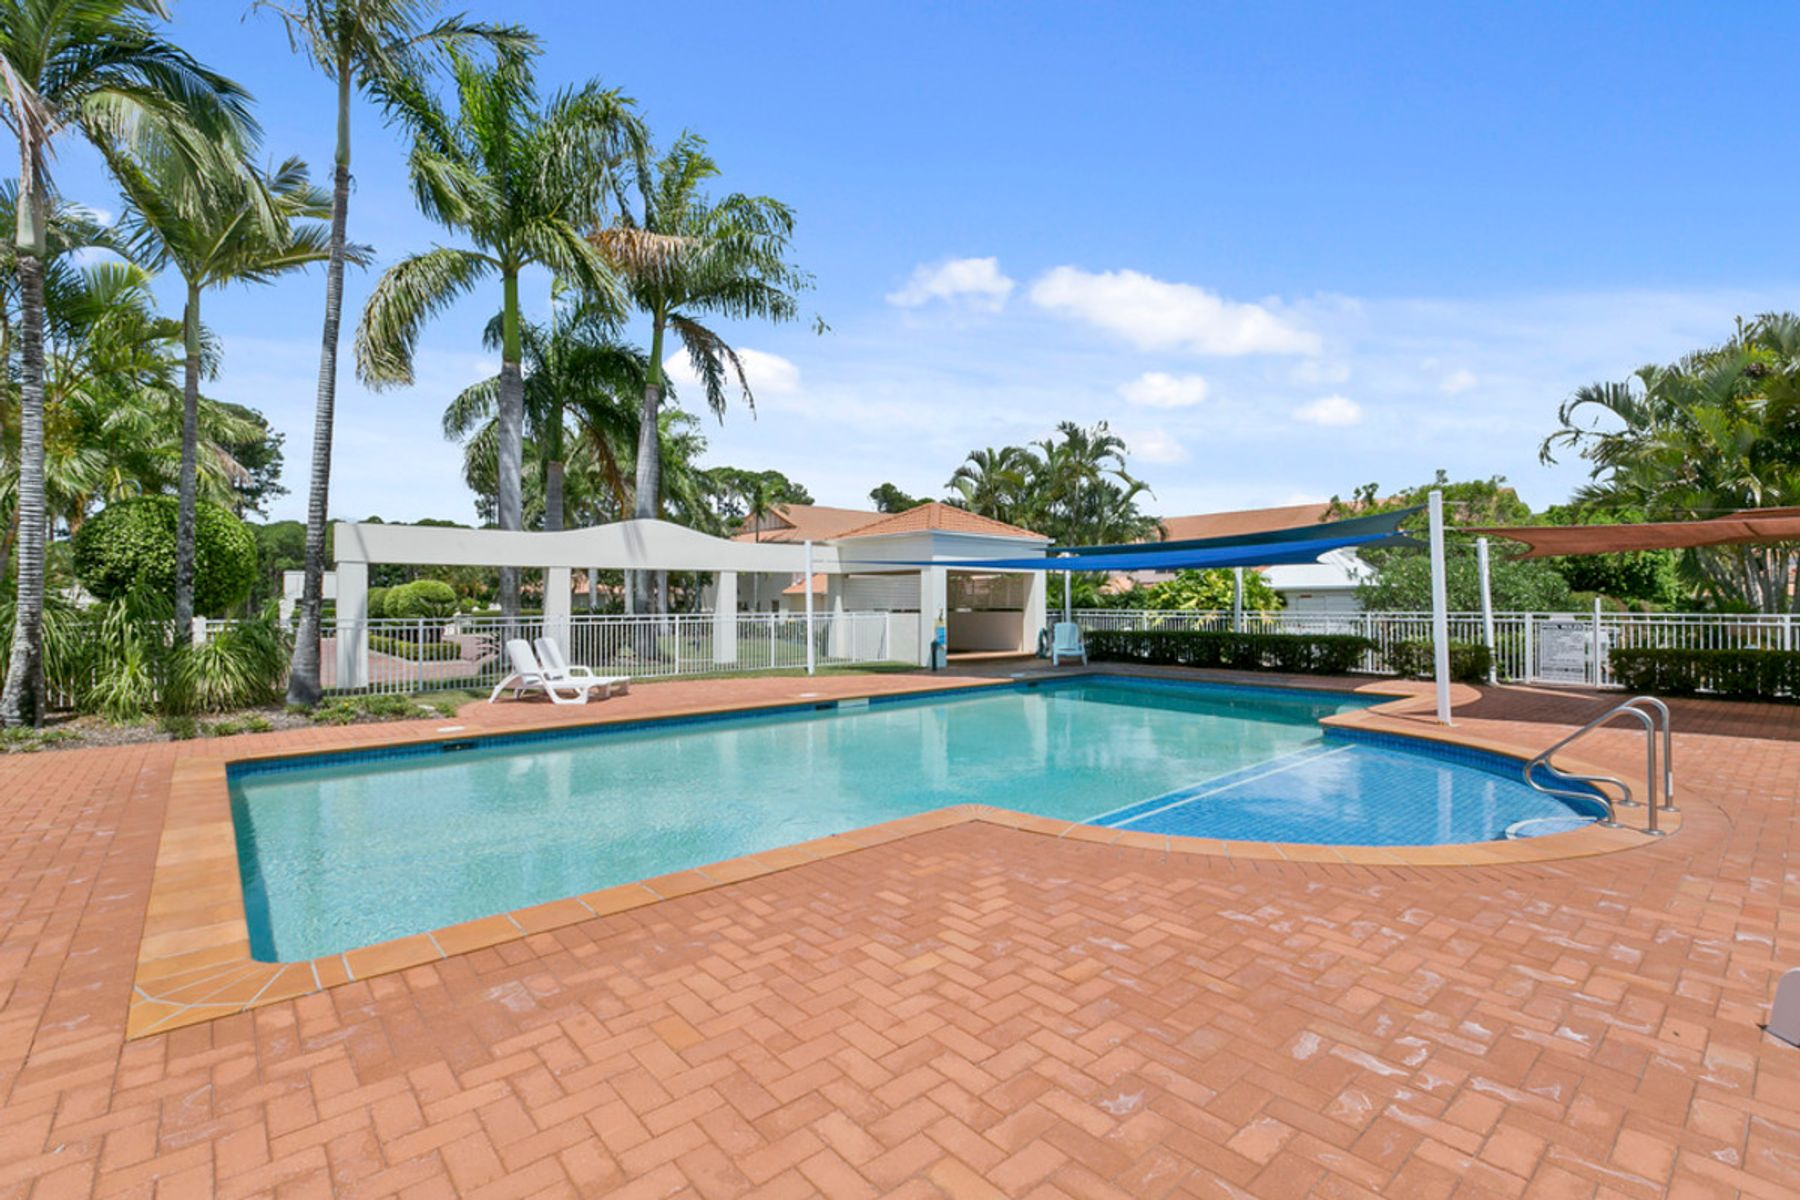 7/60 Caseys Road, Hope Island, QLD 4212